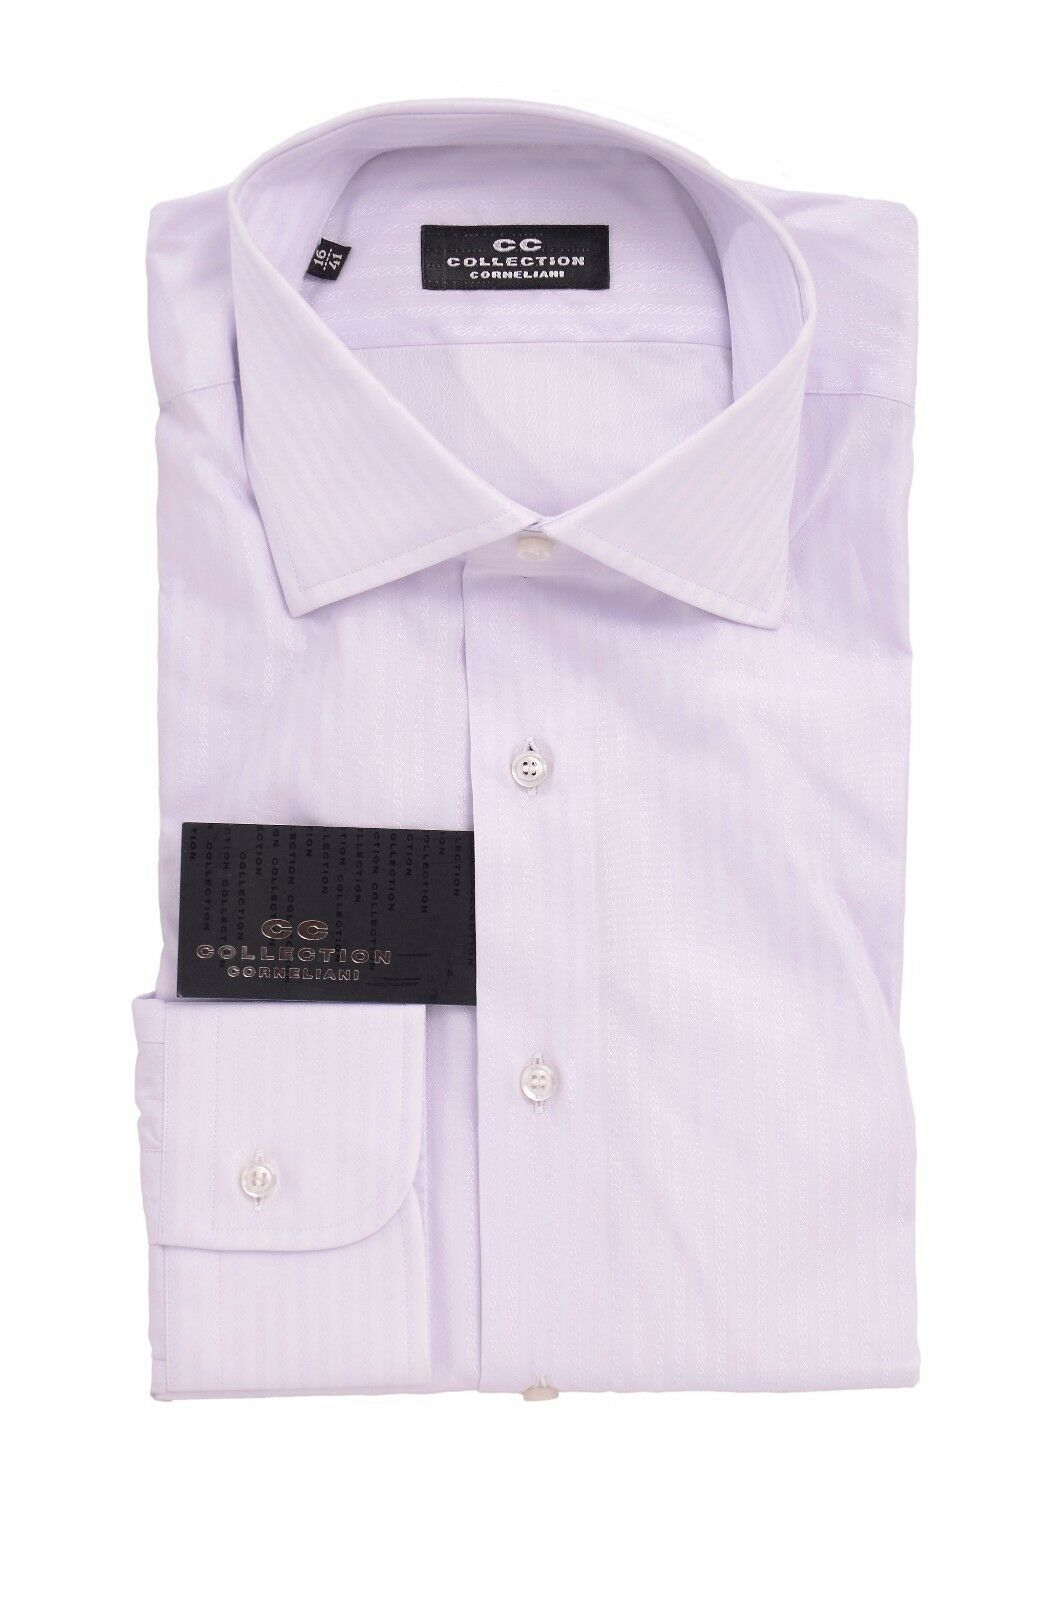 Collection Corneliani Light lila Cotton Blend Dress Shirt 16 41 Made in